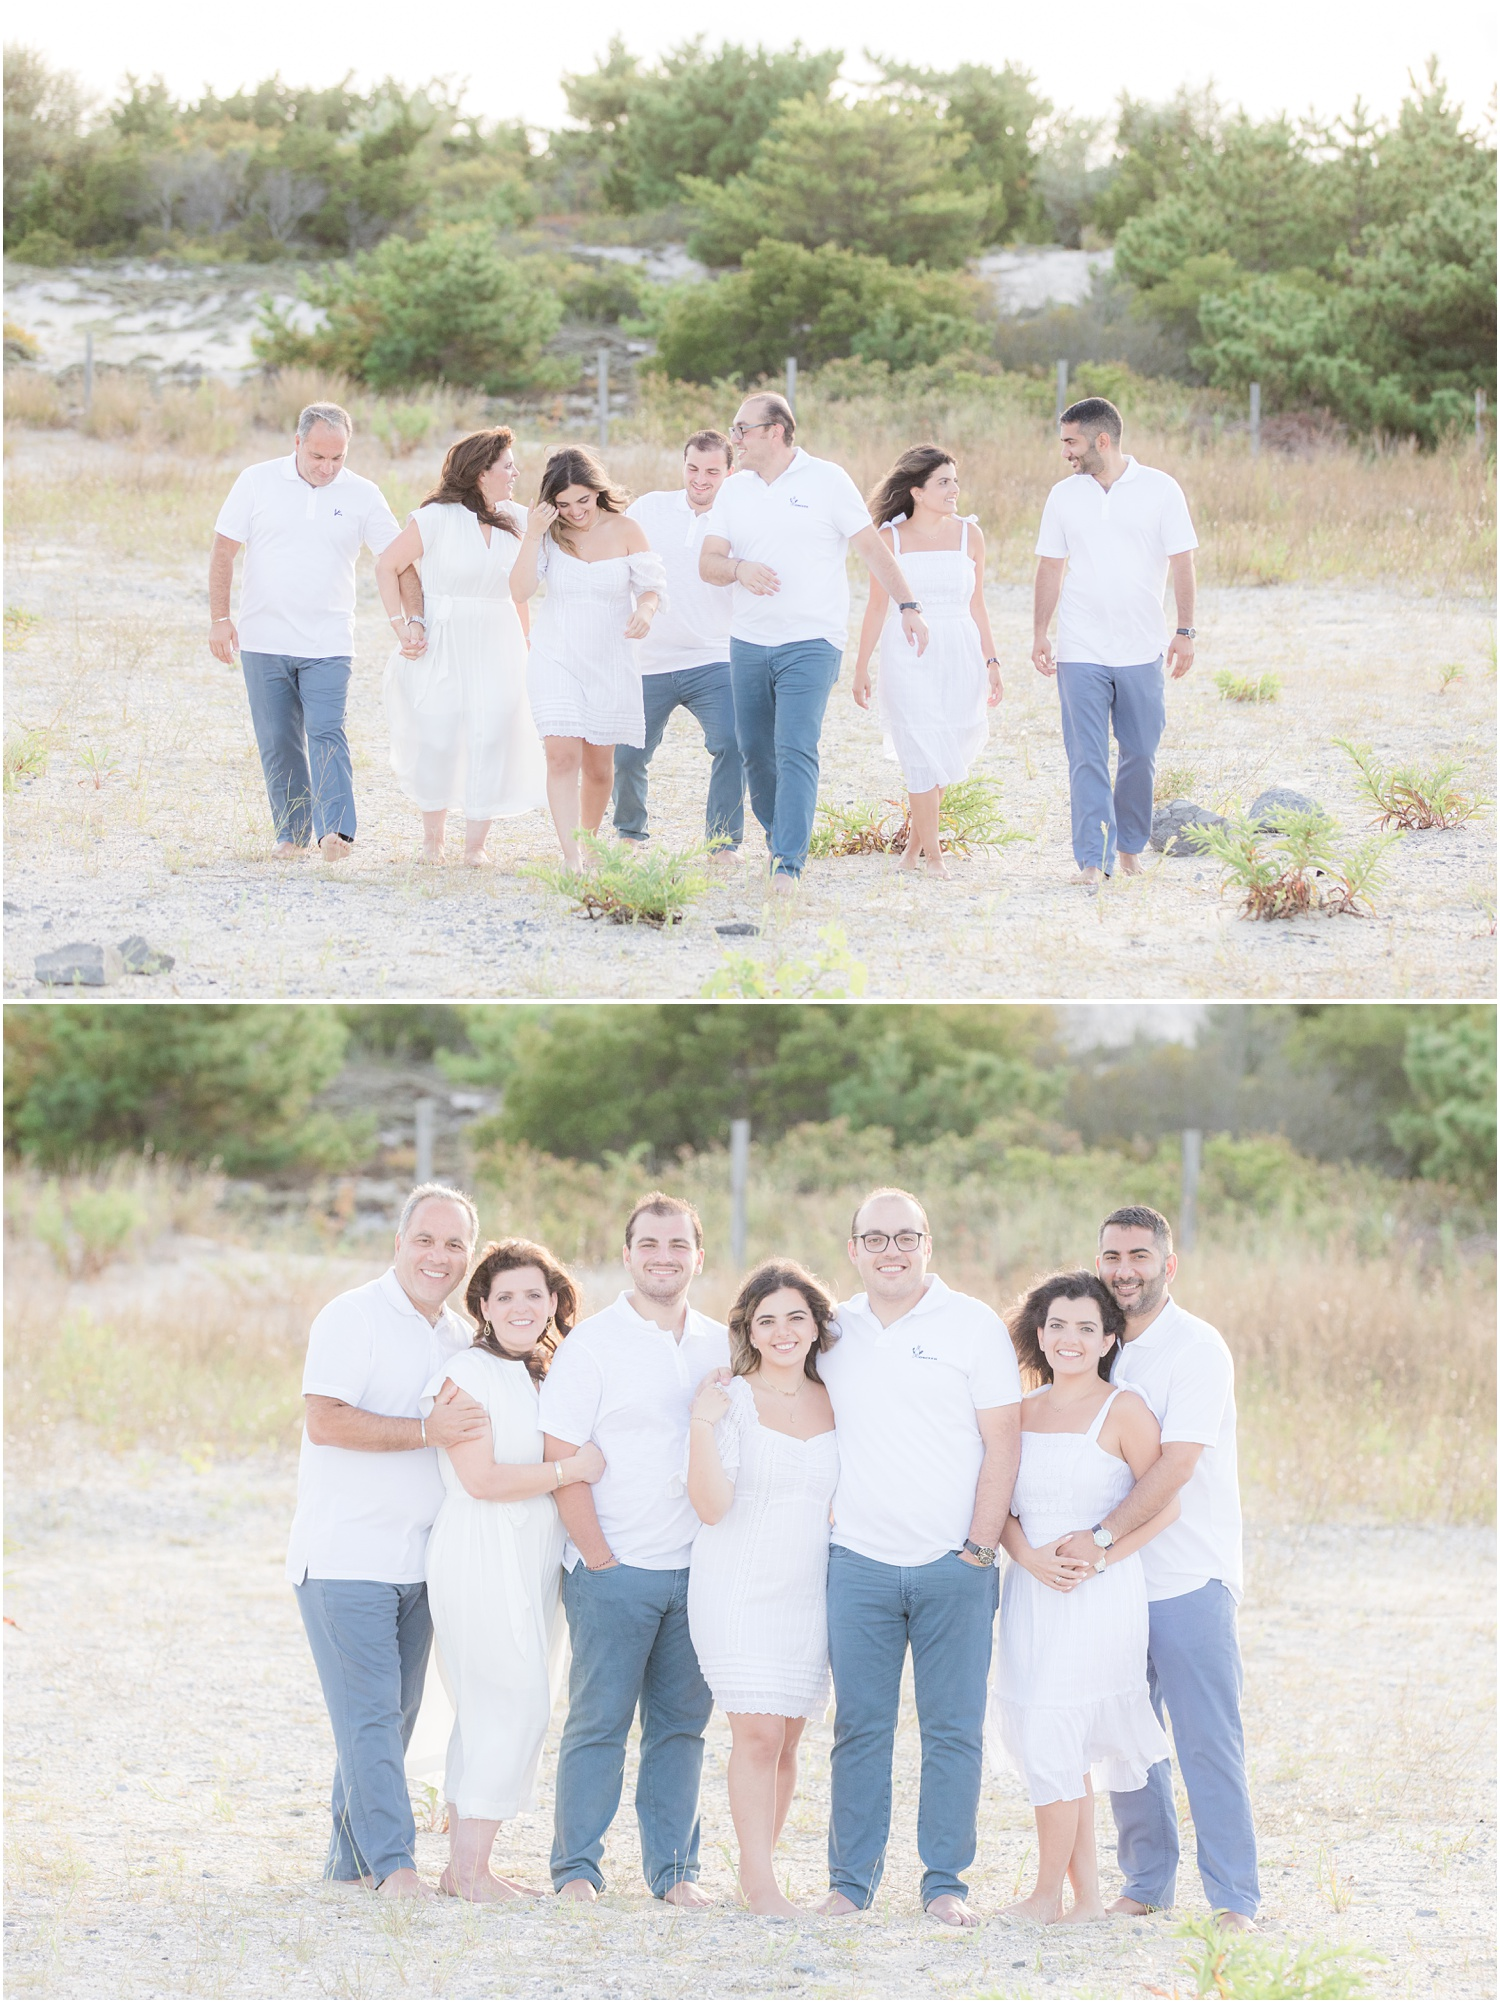 Family photos at Barnegat Light in LBI